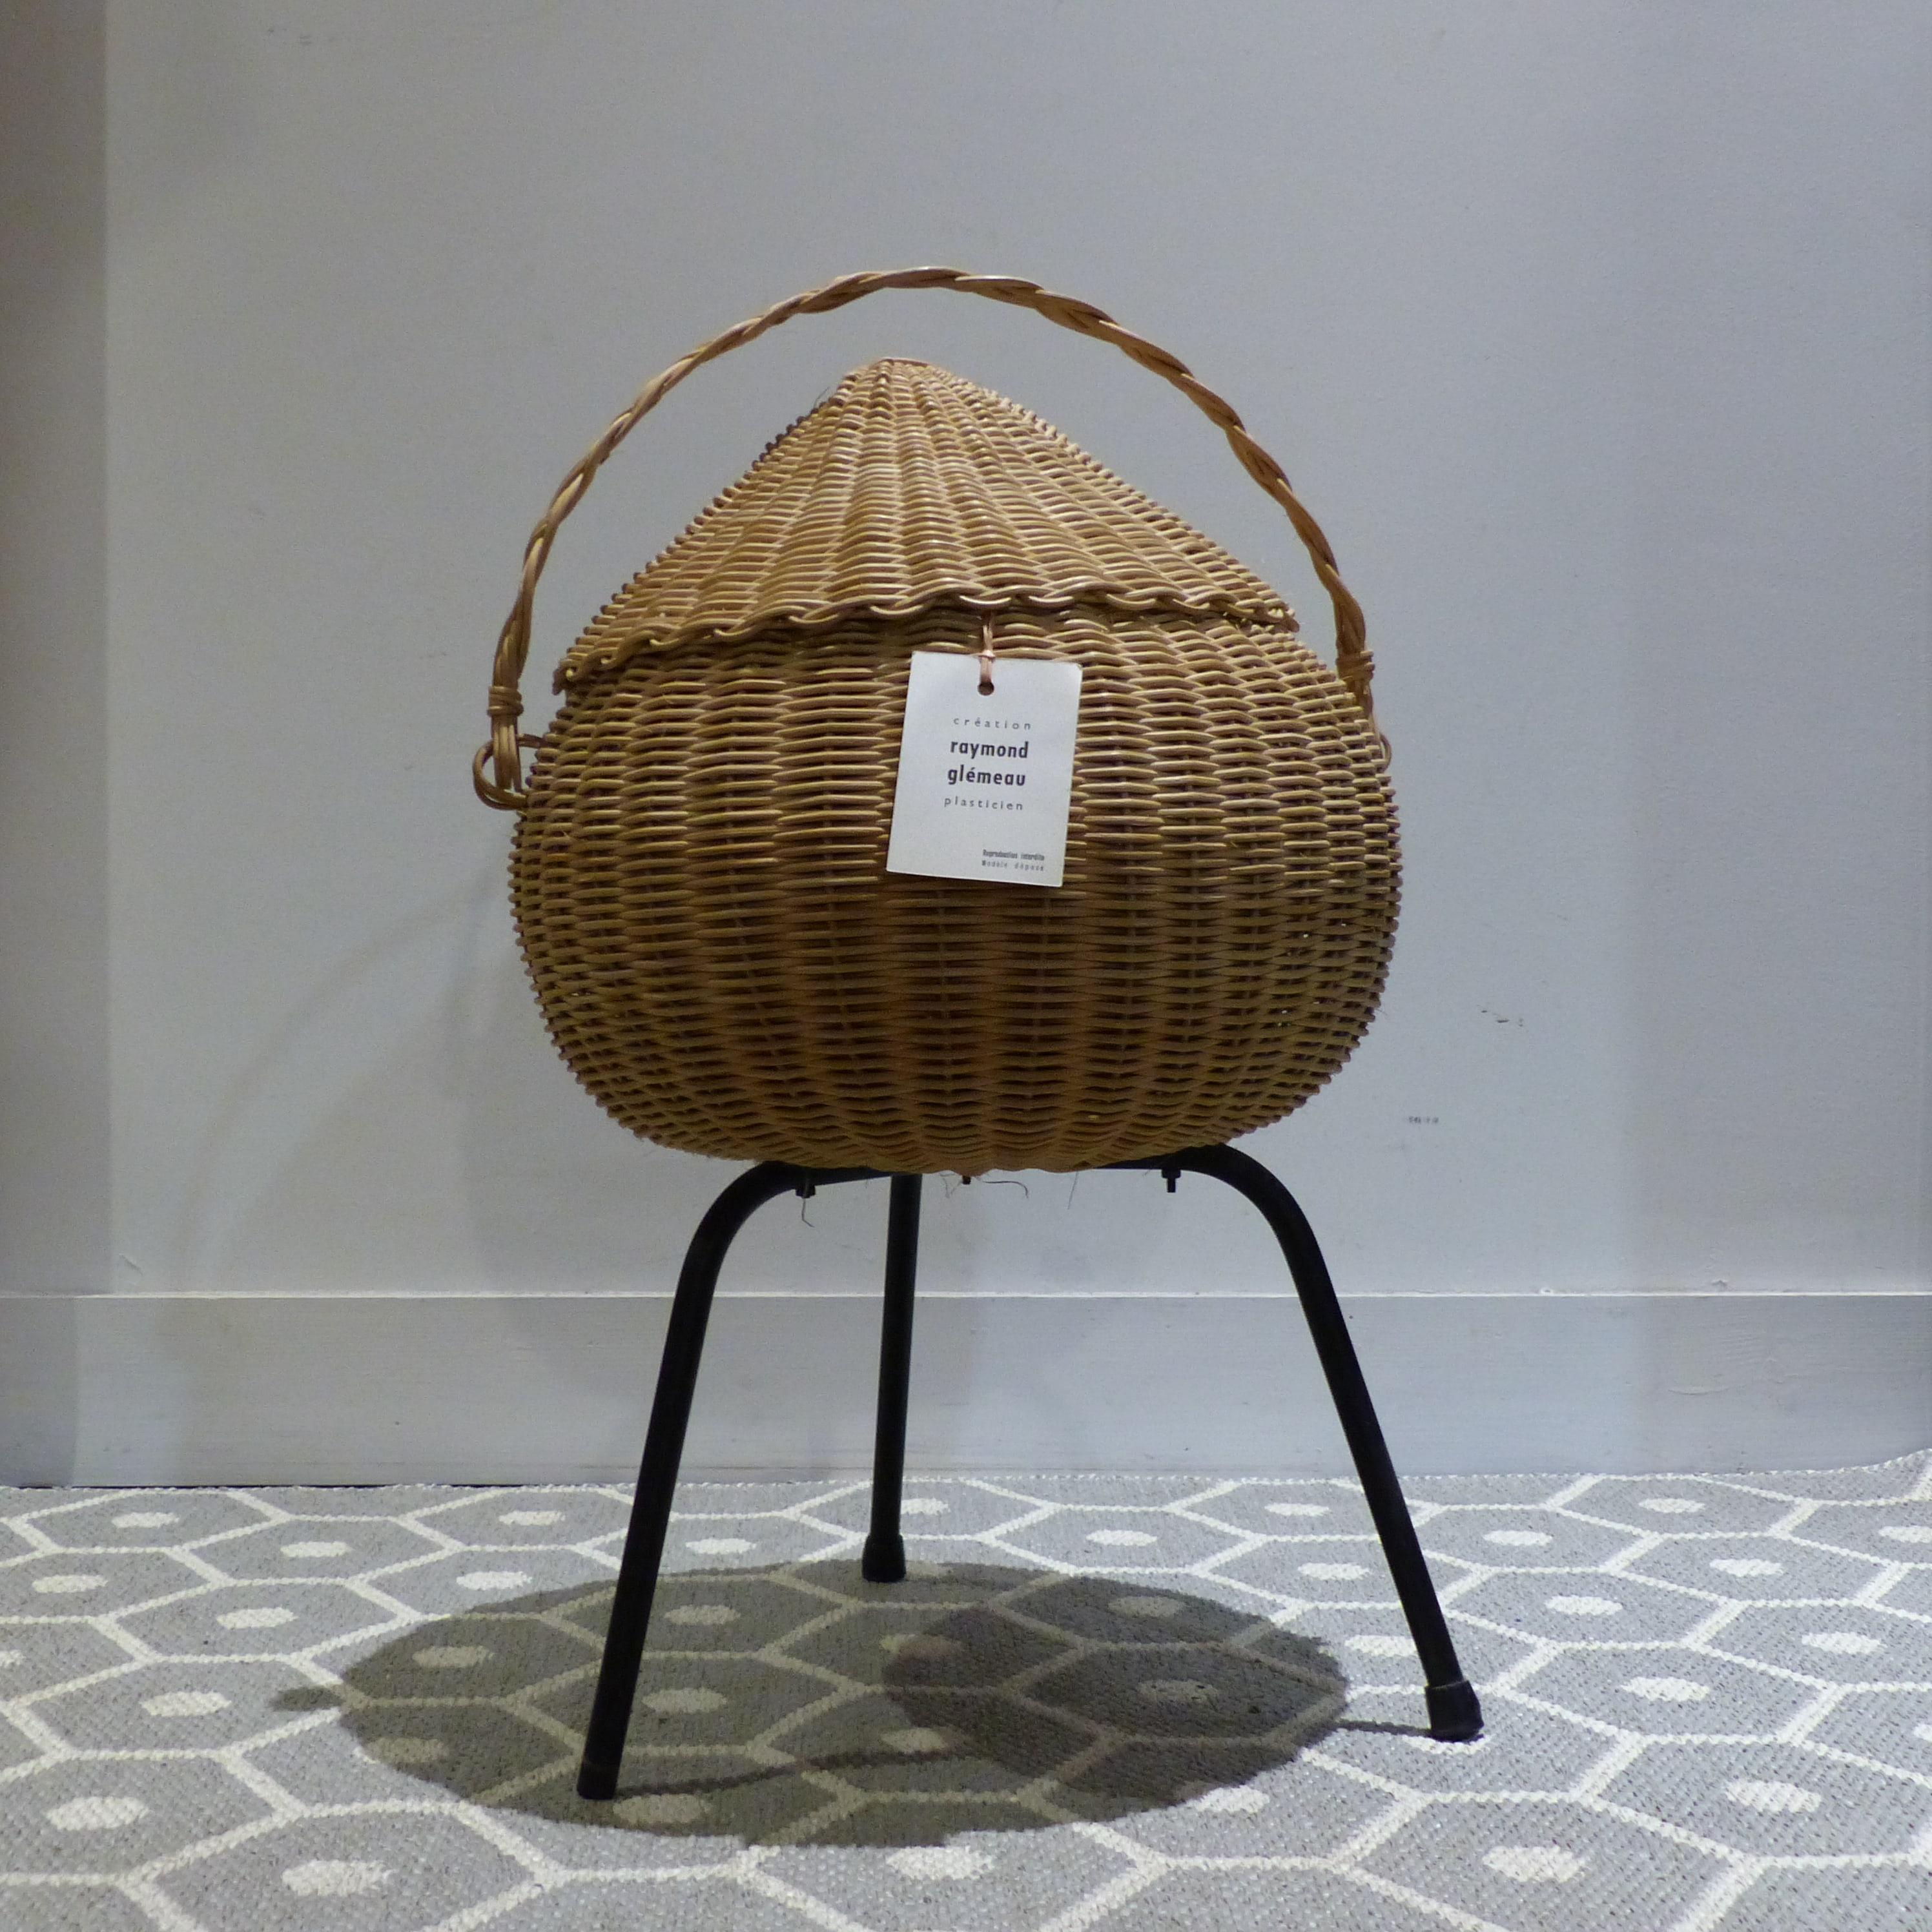 travailleuse en rotin pi tement m tal tripode lignedebrocante brocante en ligne chine pour. Black Bedroom Furniture Sets. Home Design Ideas